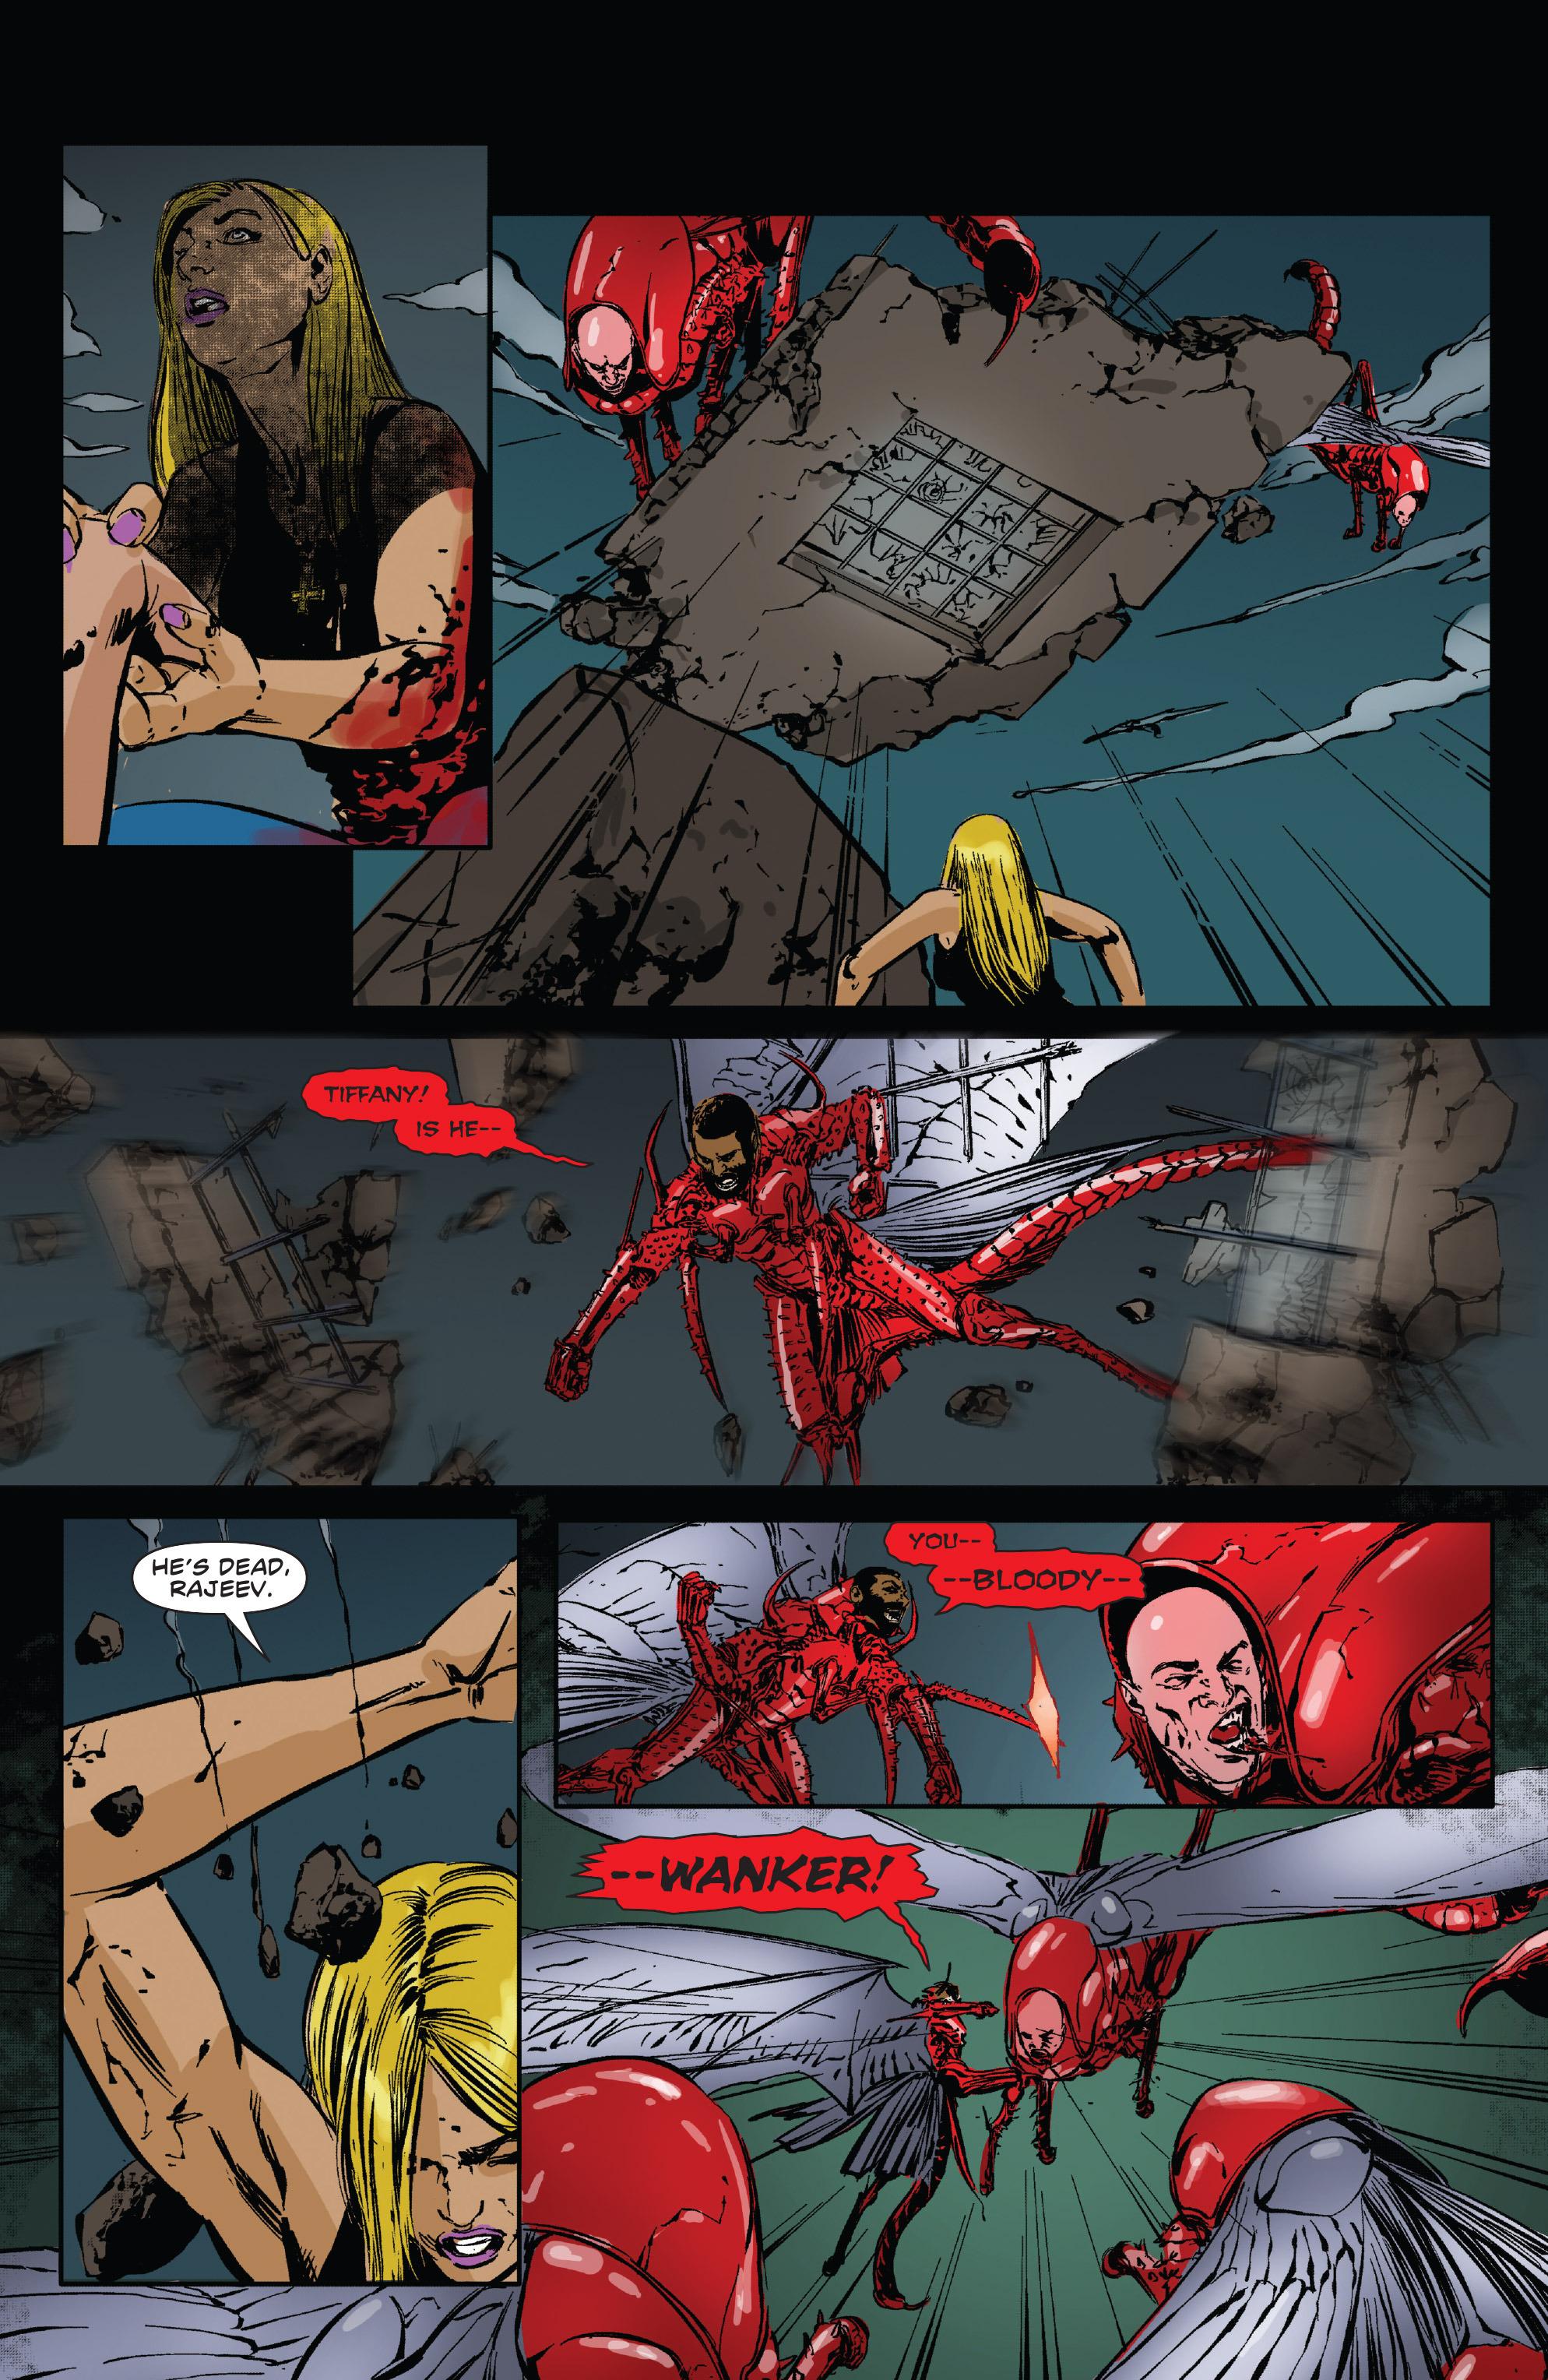 Read online Clive Barker's Hellraiser: The Dark Watch comic -  Issue # TPB 3 - 93